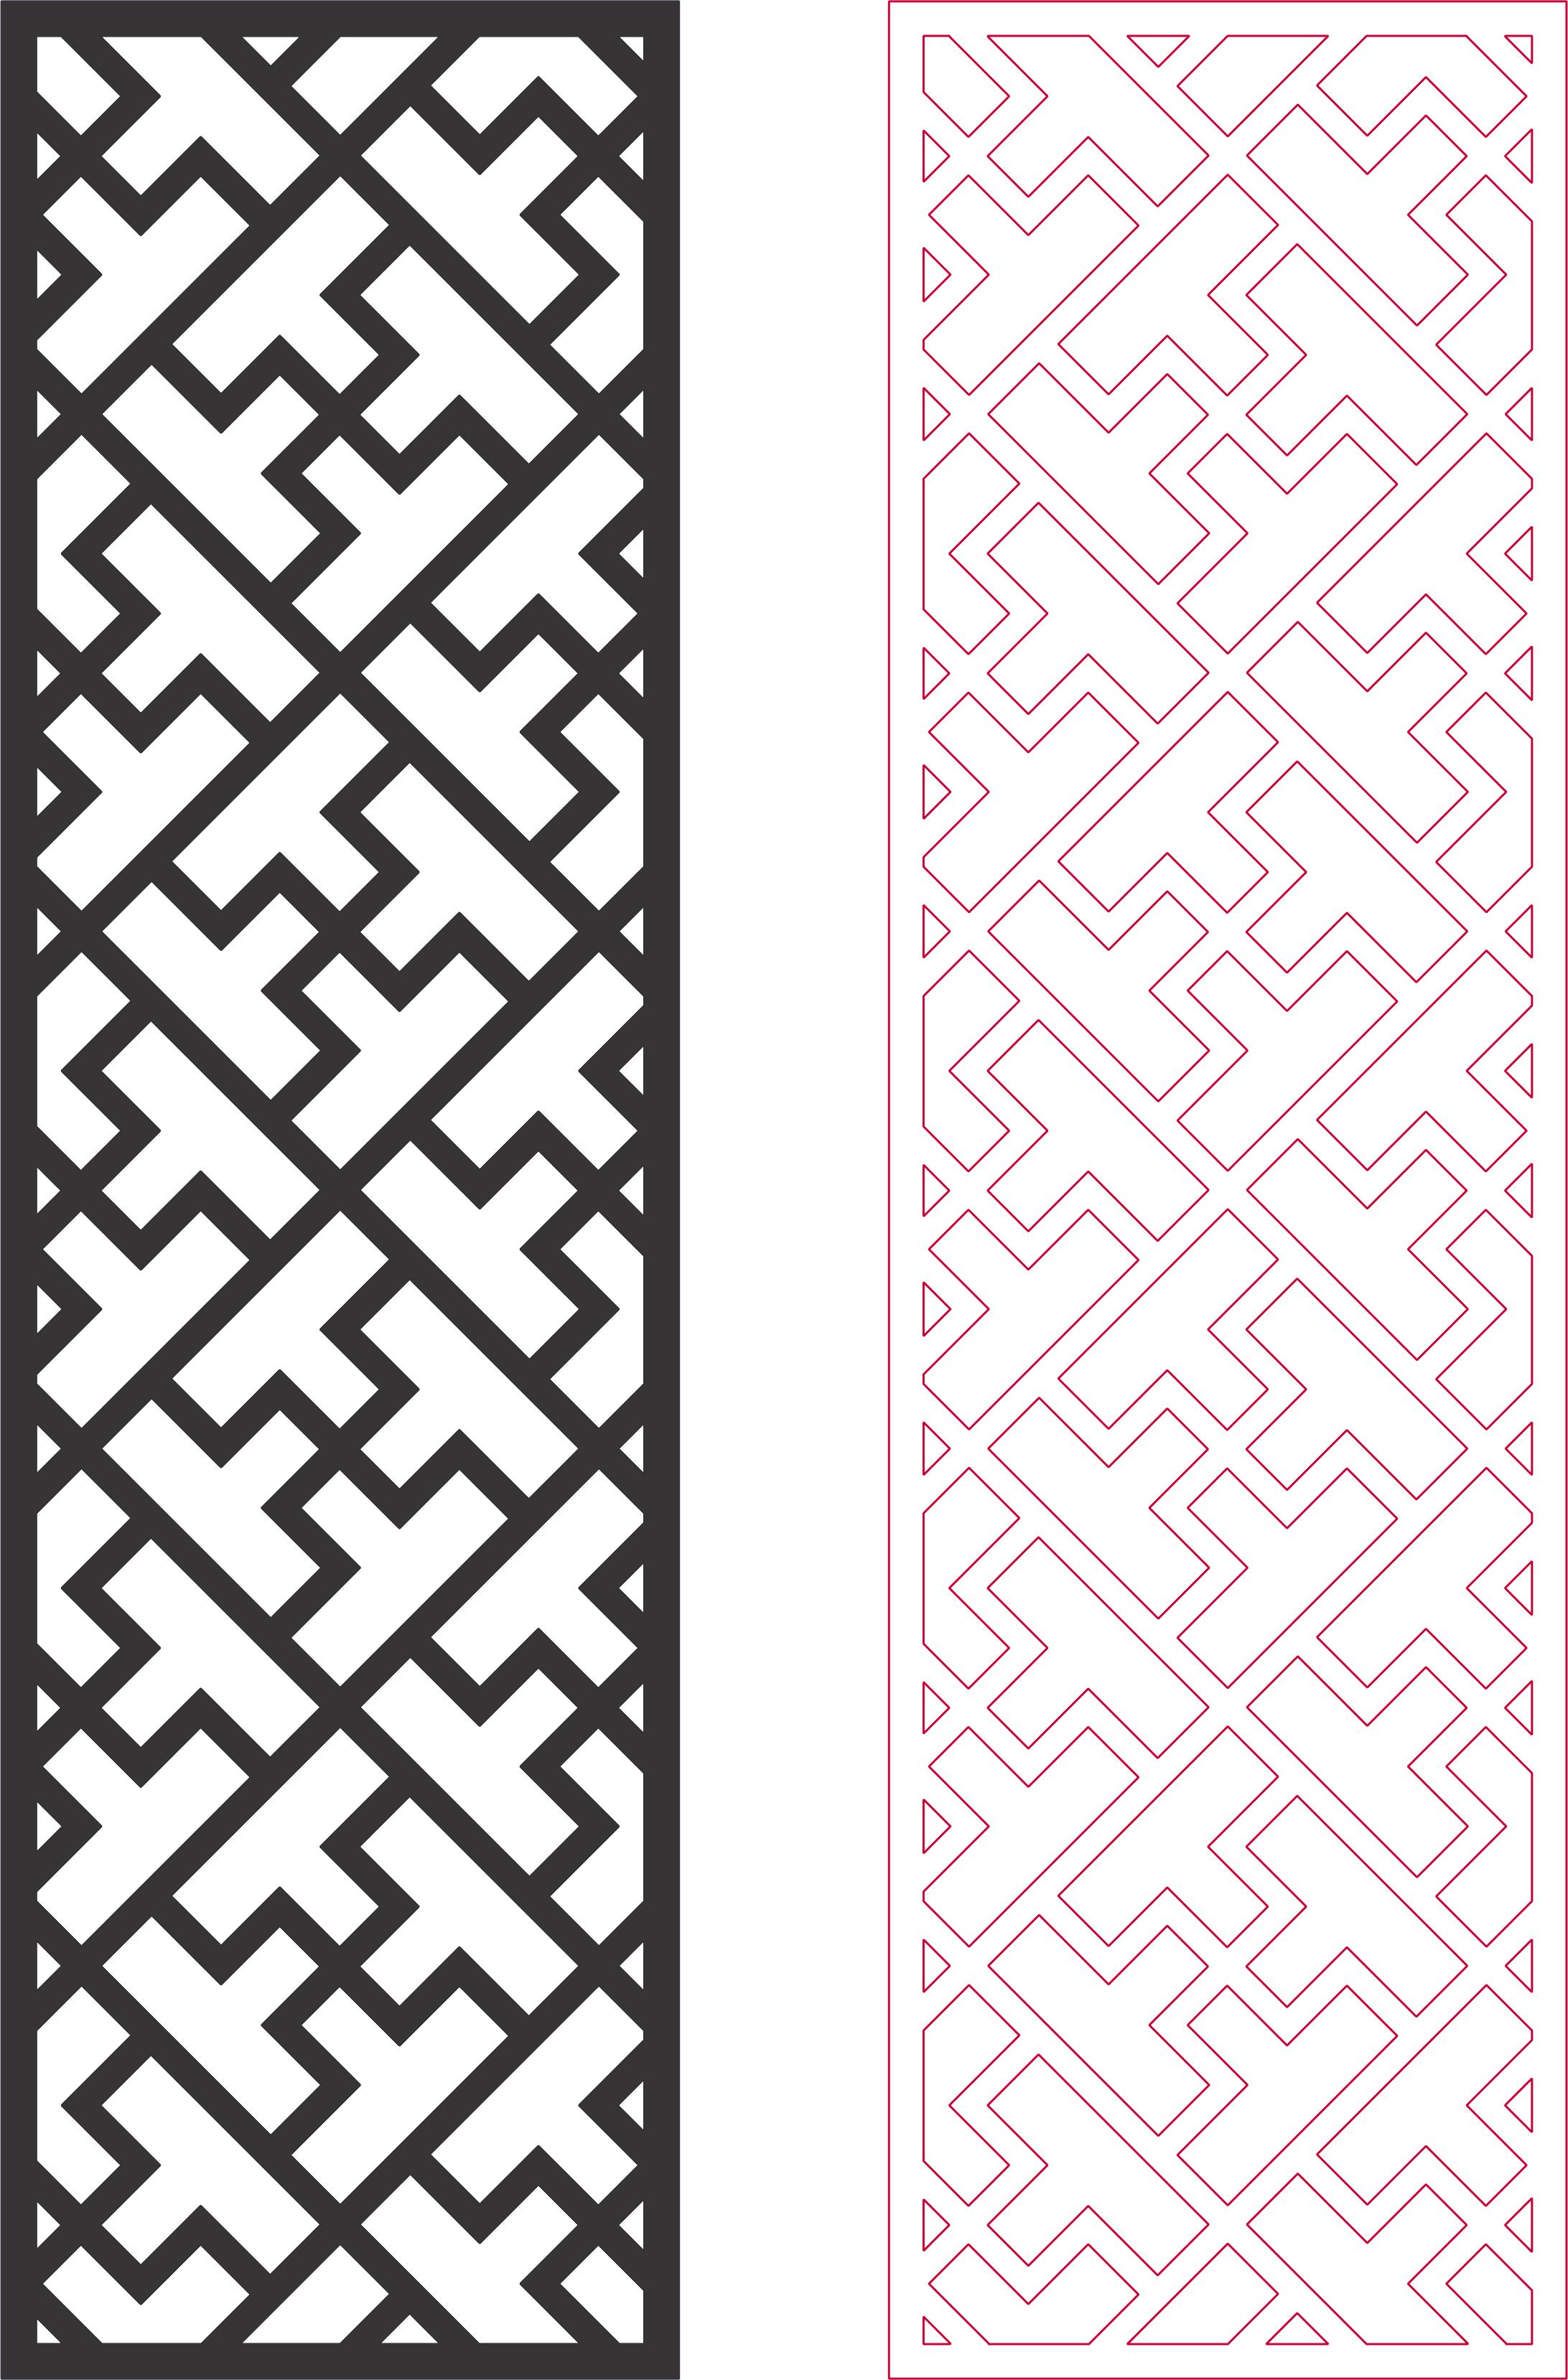 Dxf Pattern Designs 2d 123 DXF File